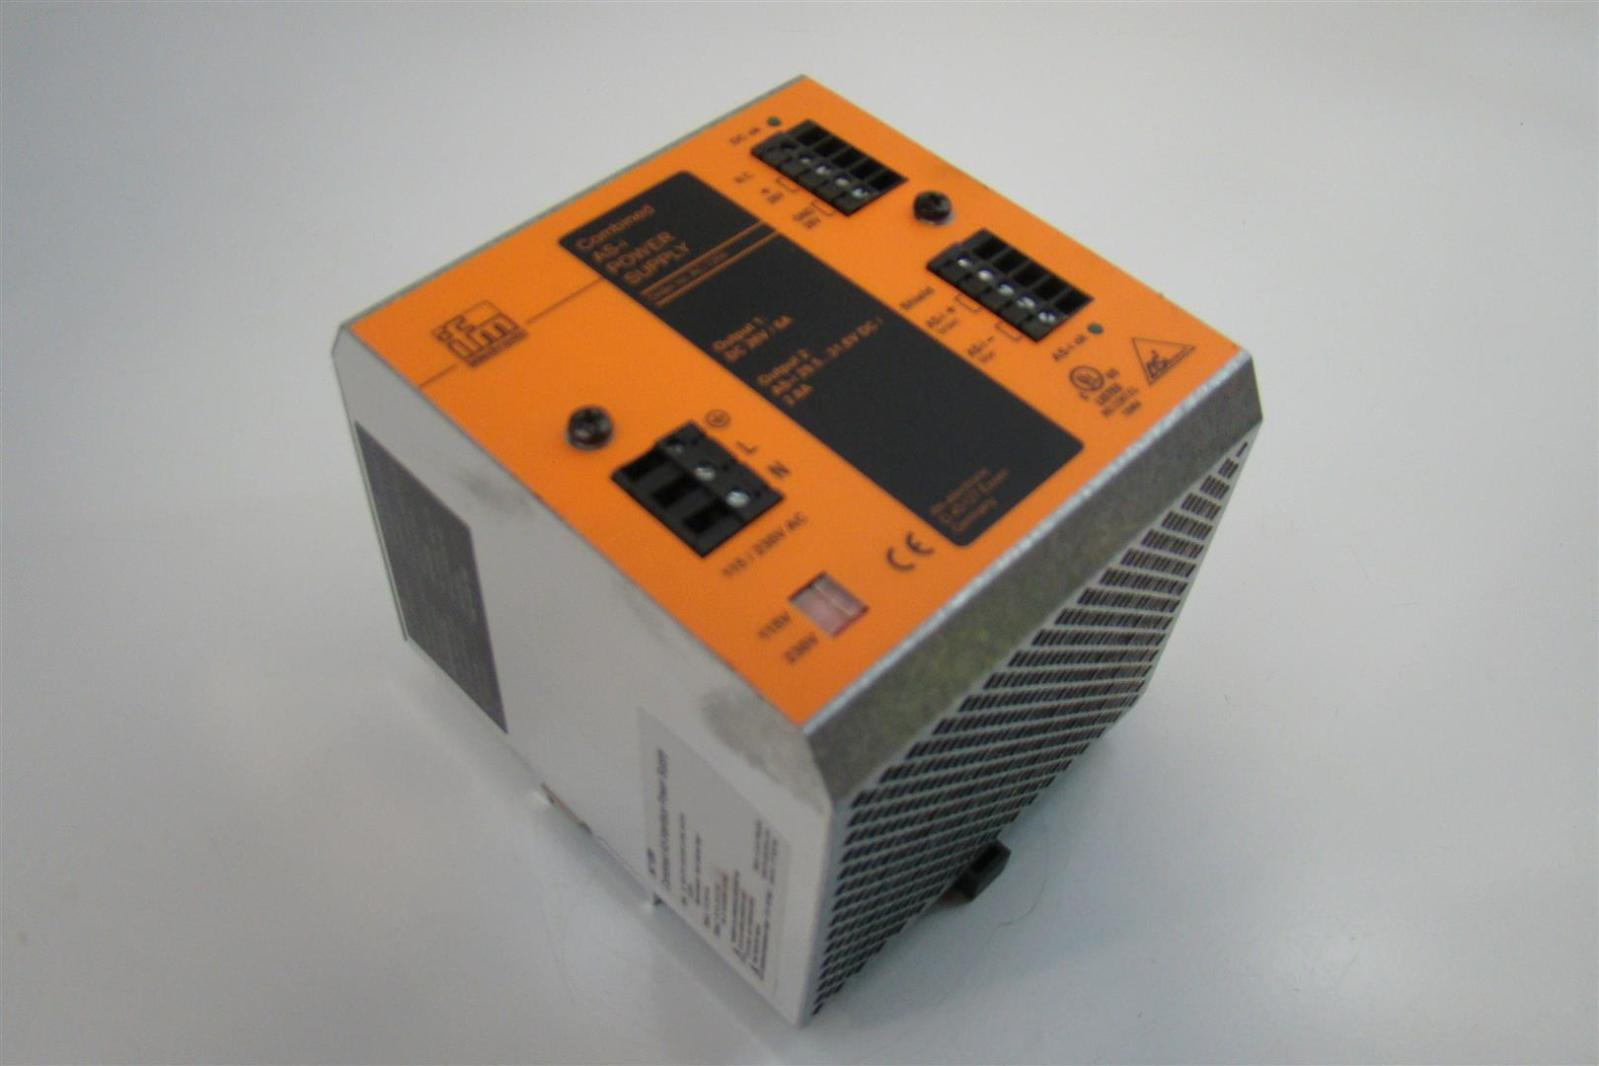 ASI ELECTRONICS IMDS25M INTERFACE MODULE DIN-RAIL MOUNT 25PIN NIB